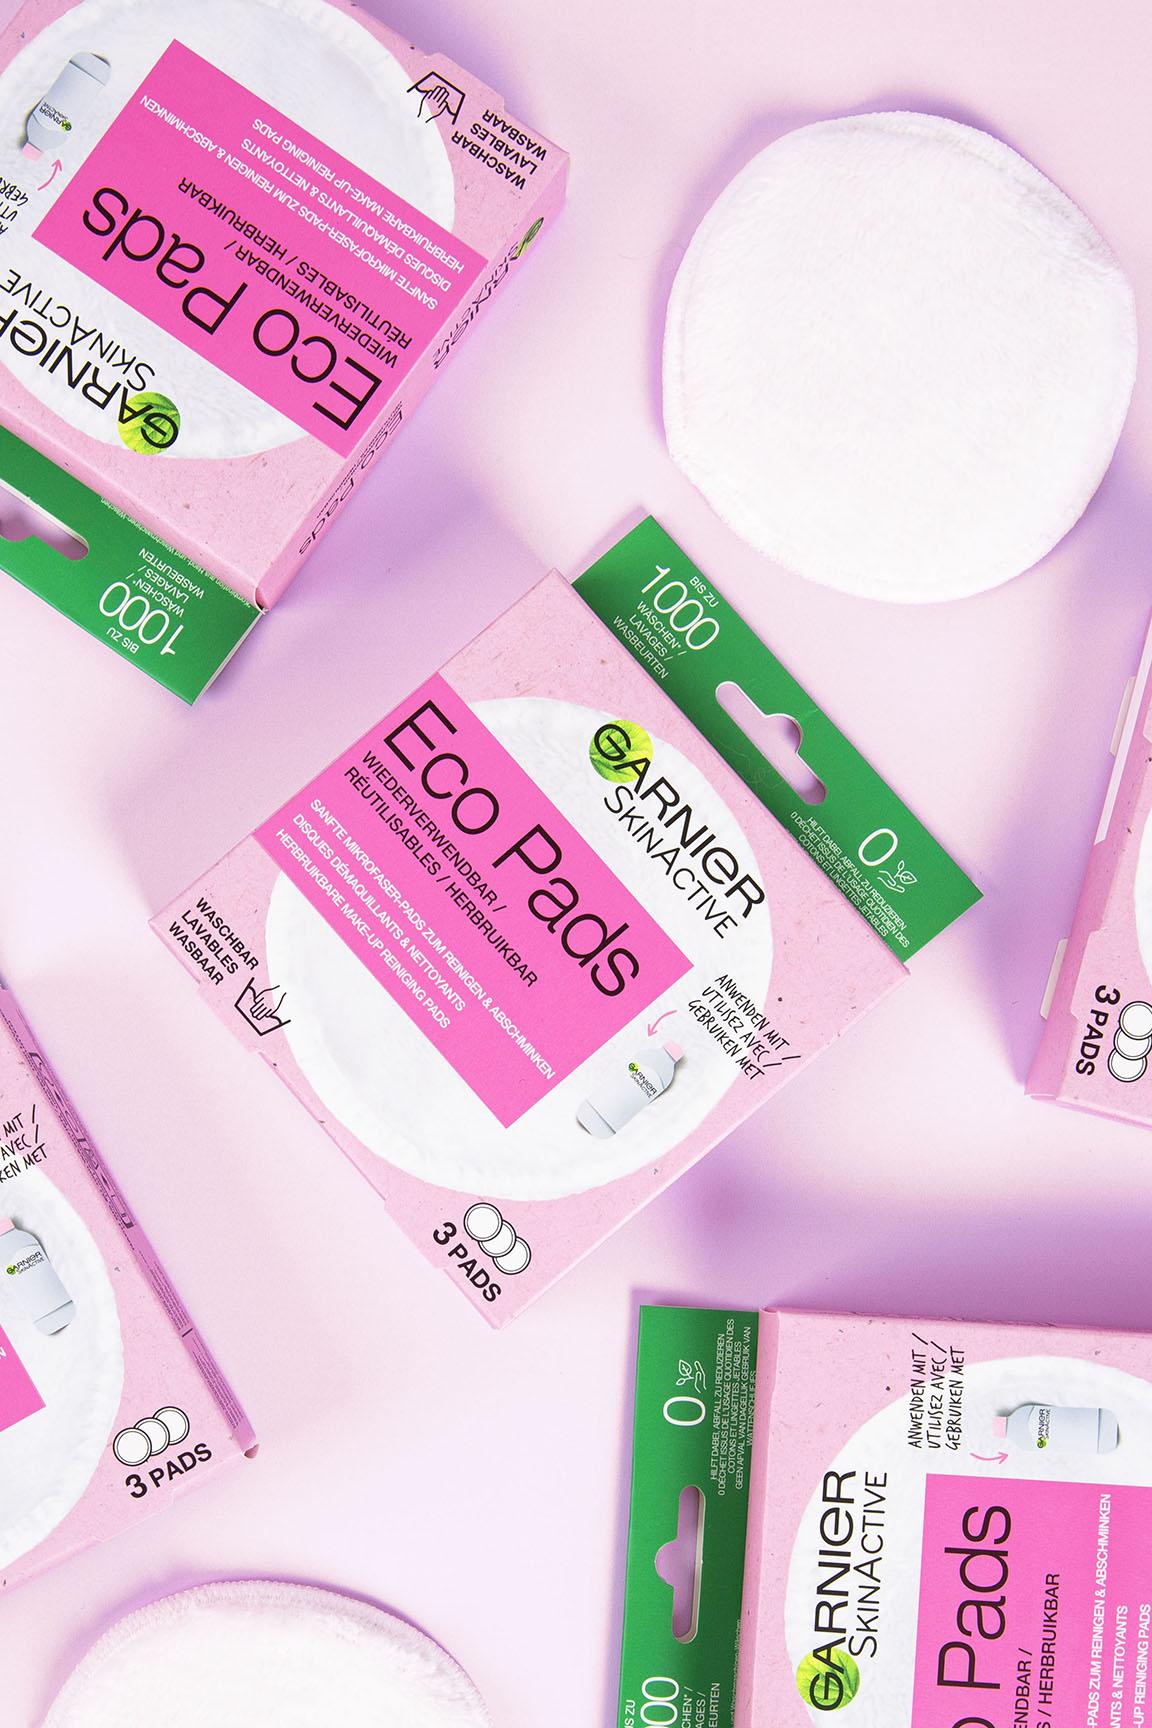 Garnier eco pads design-packaging recyclable-crop